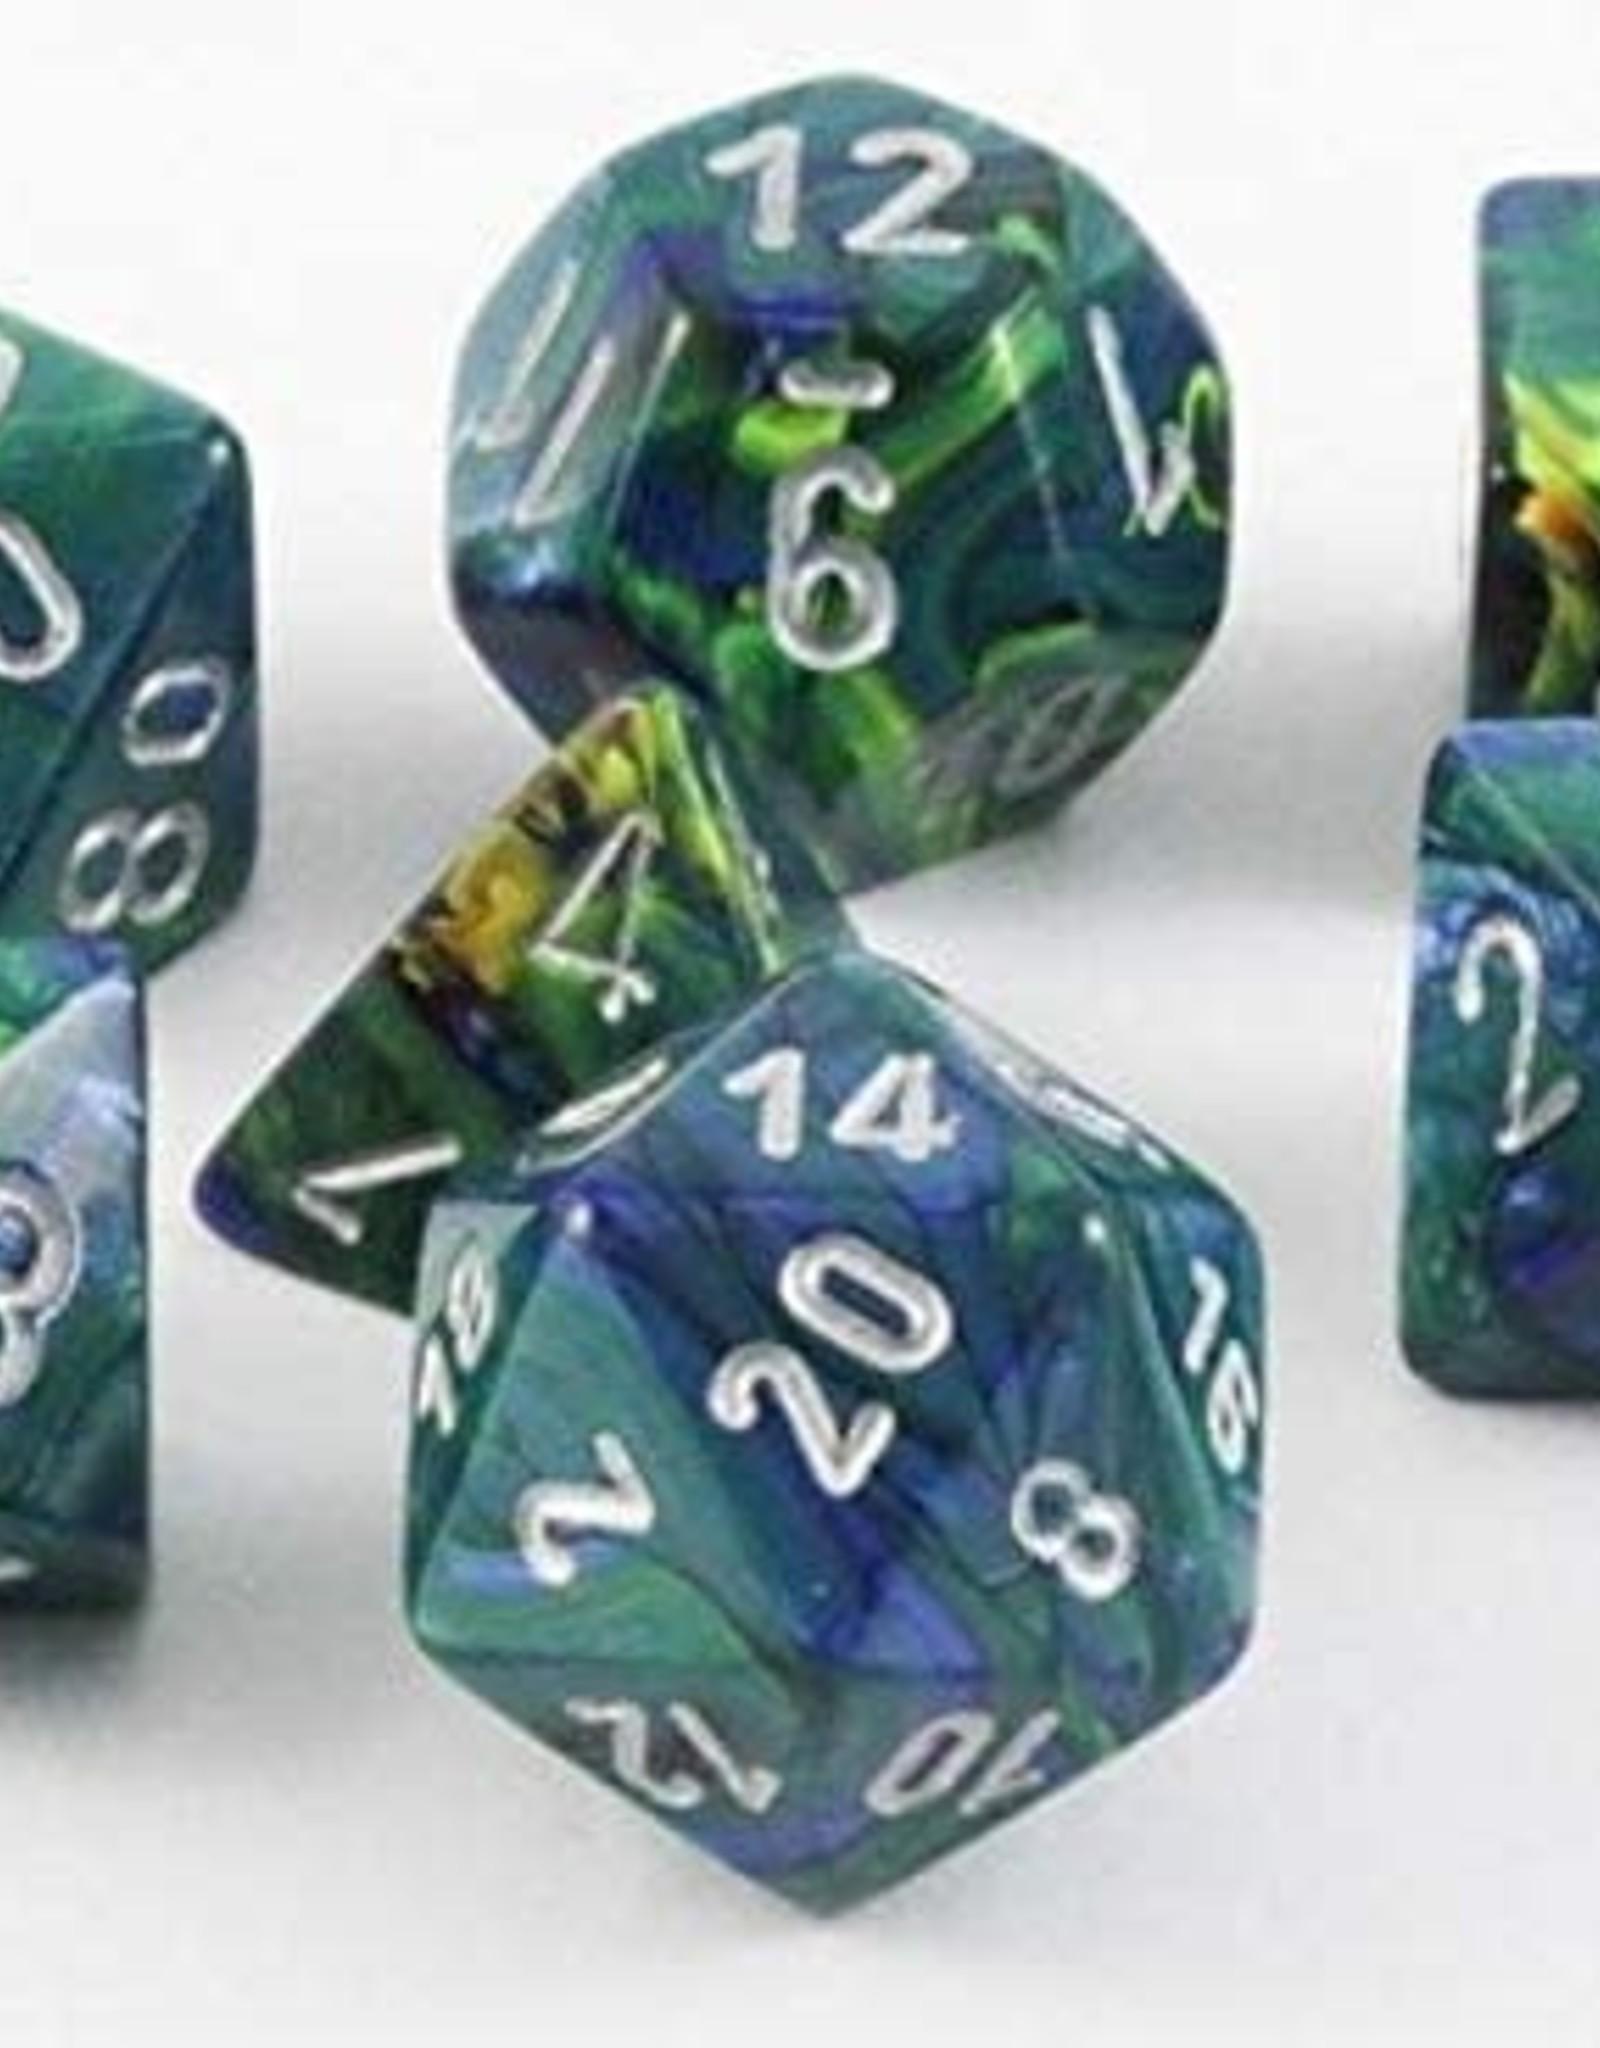 Chessex Chessex CHX27445 Dice-Festive Green/Silver Set